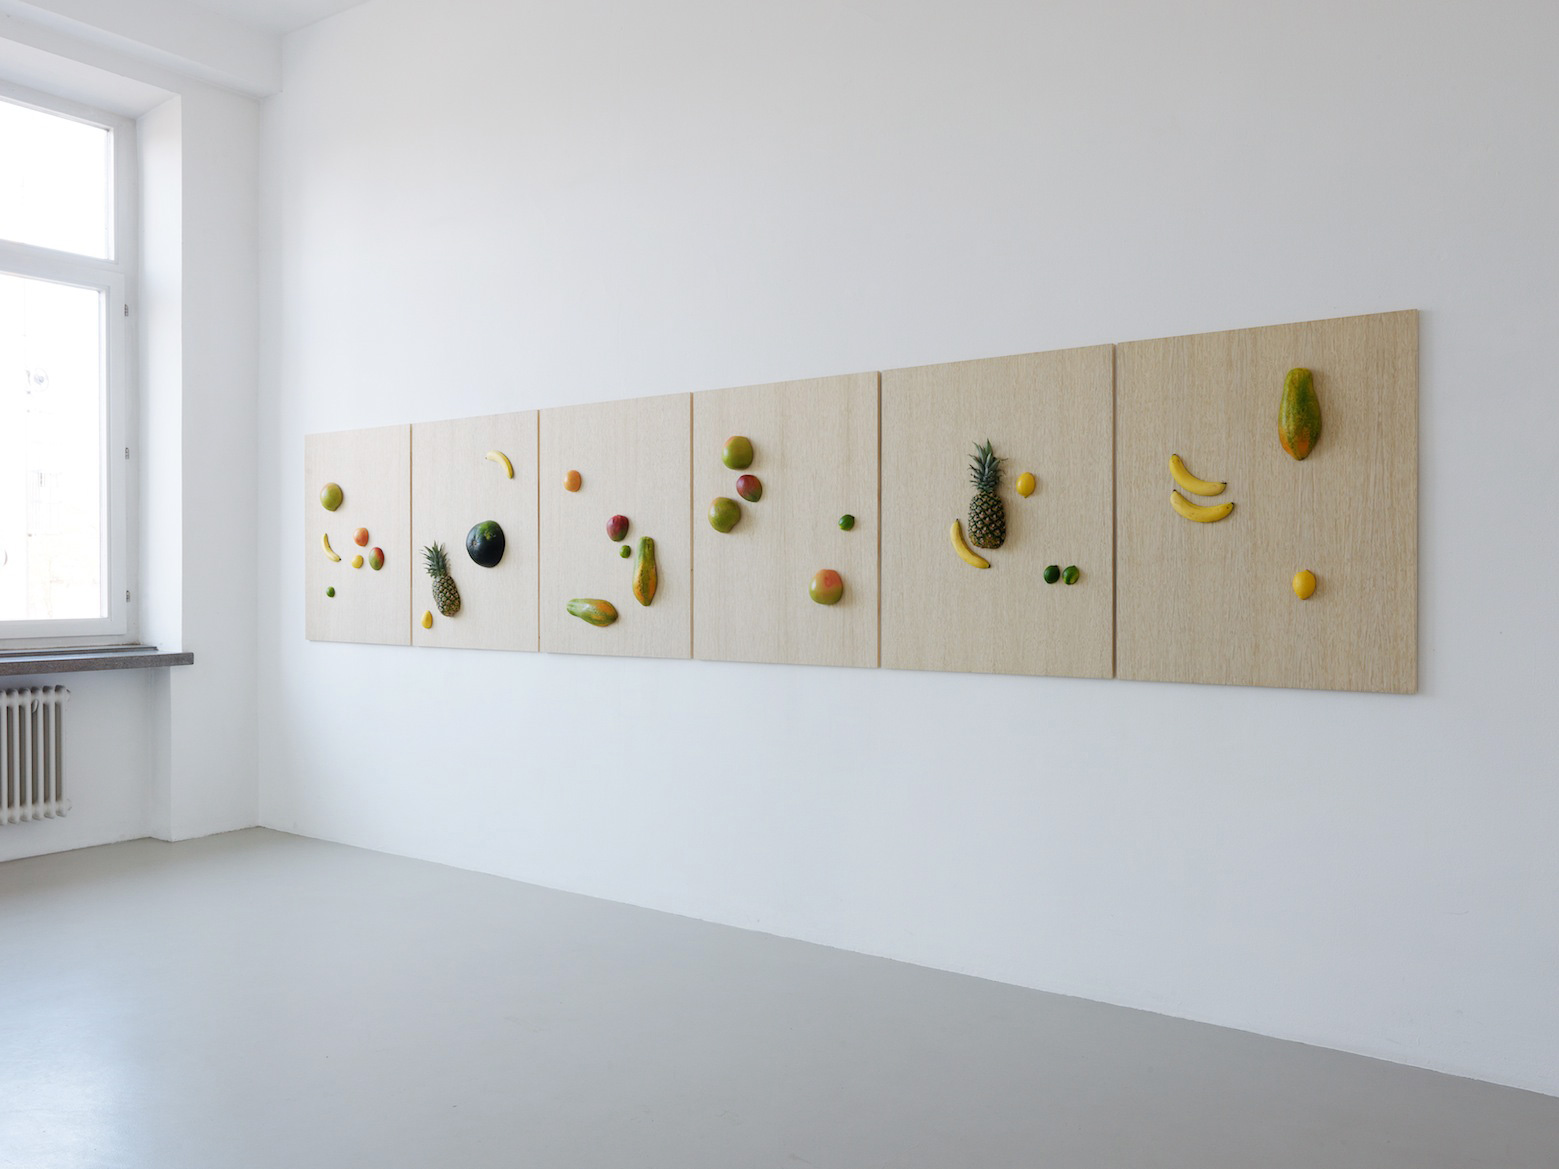 Galerie Barbara Thumm \ Diango Hernández – In hazard, translated – Kunstverein Nürnberg, Germany